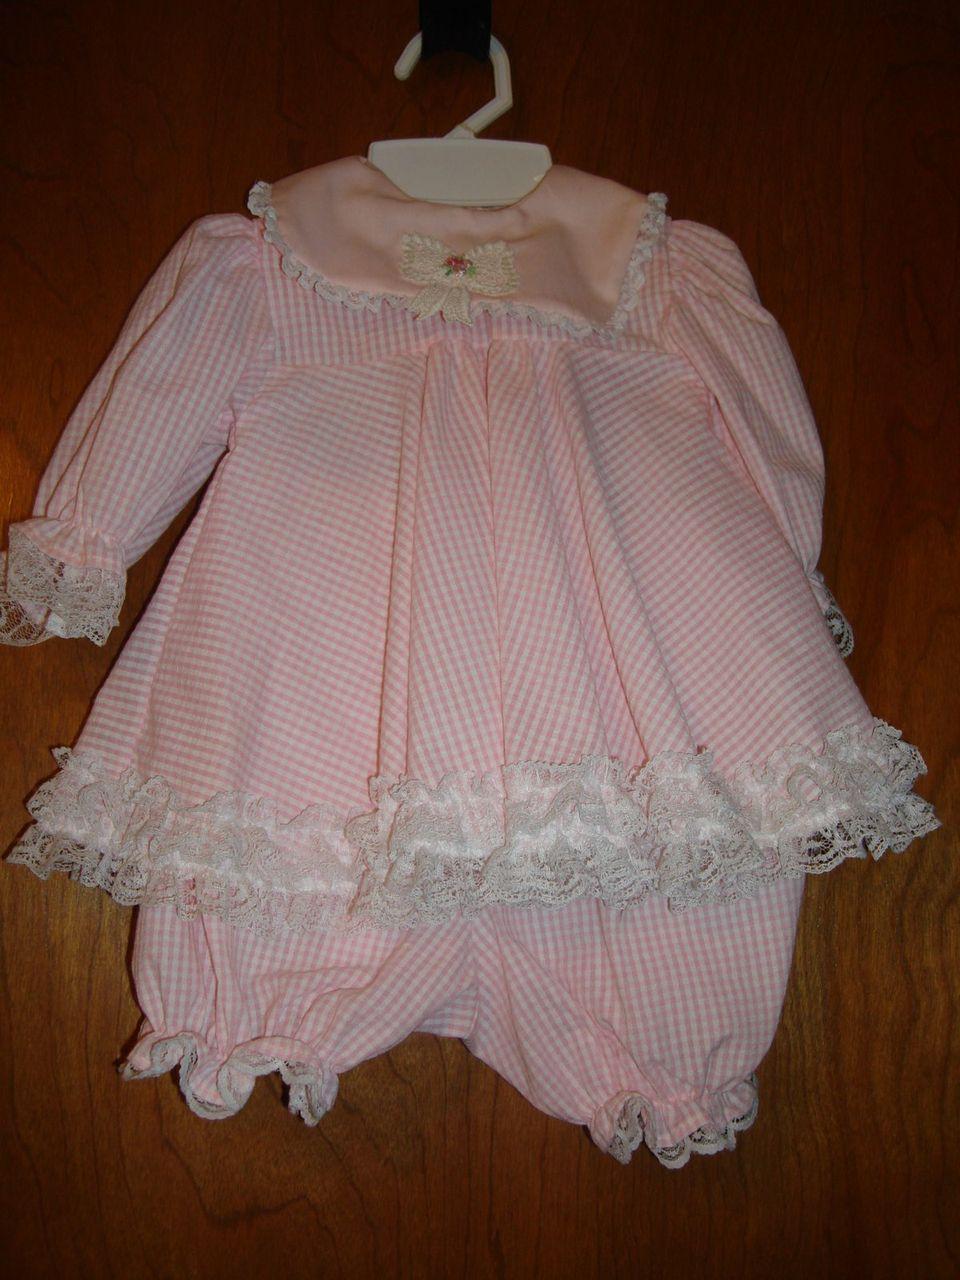 Mint Fayzah Spanos Doll Dress with Tag